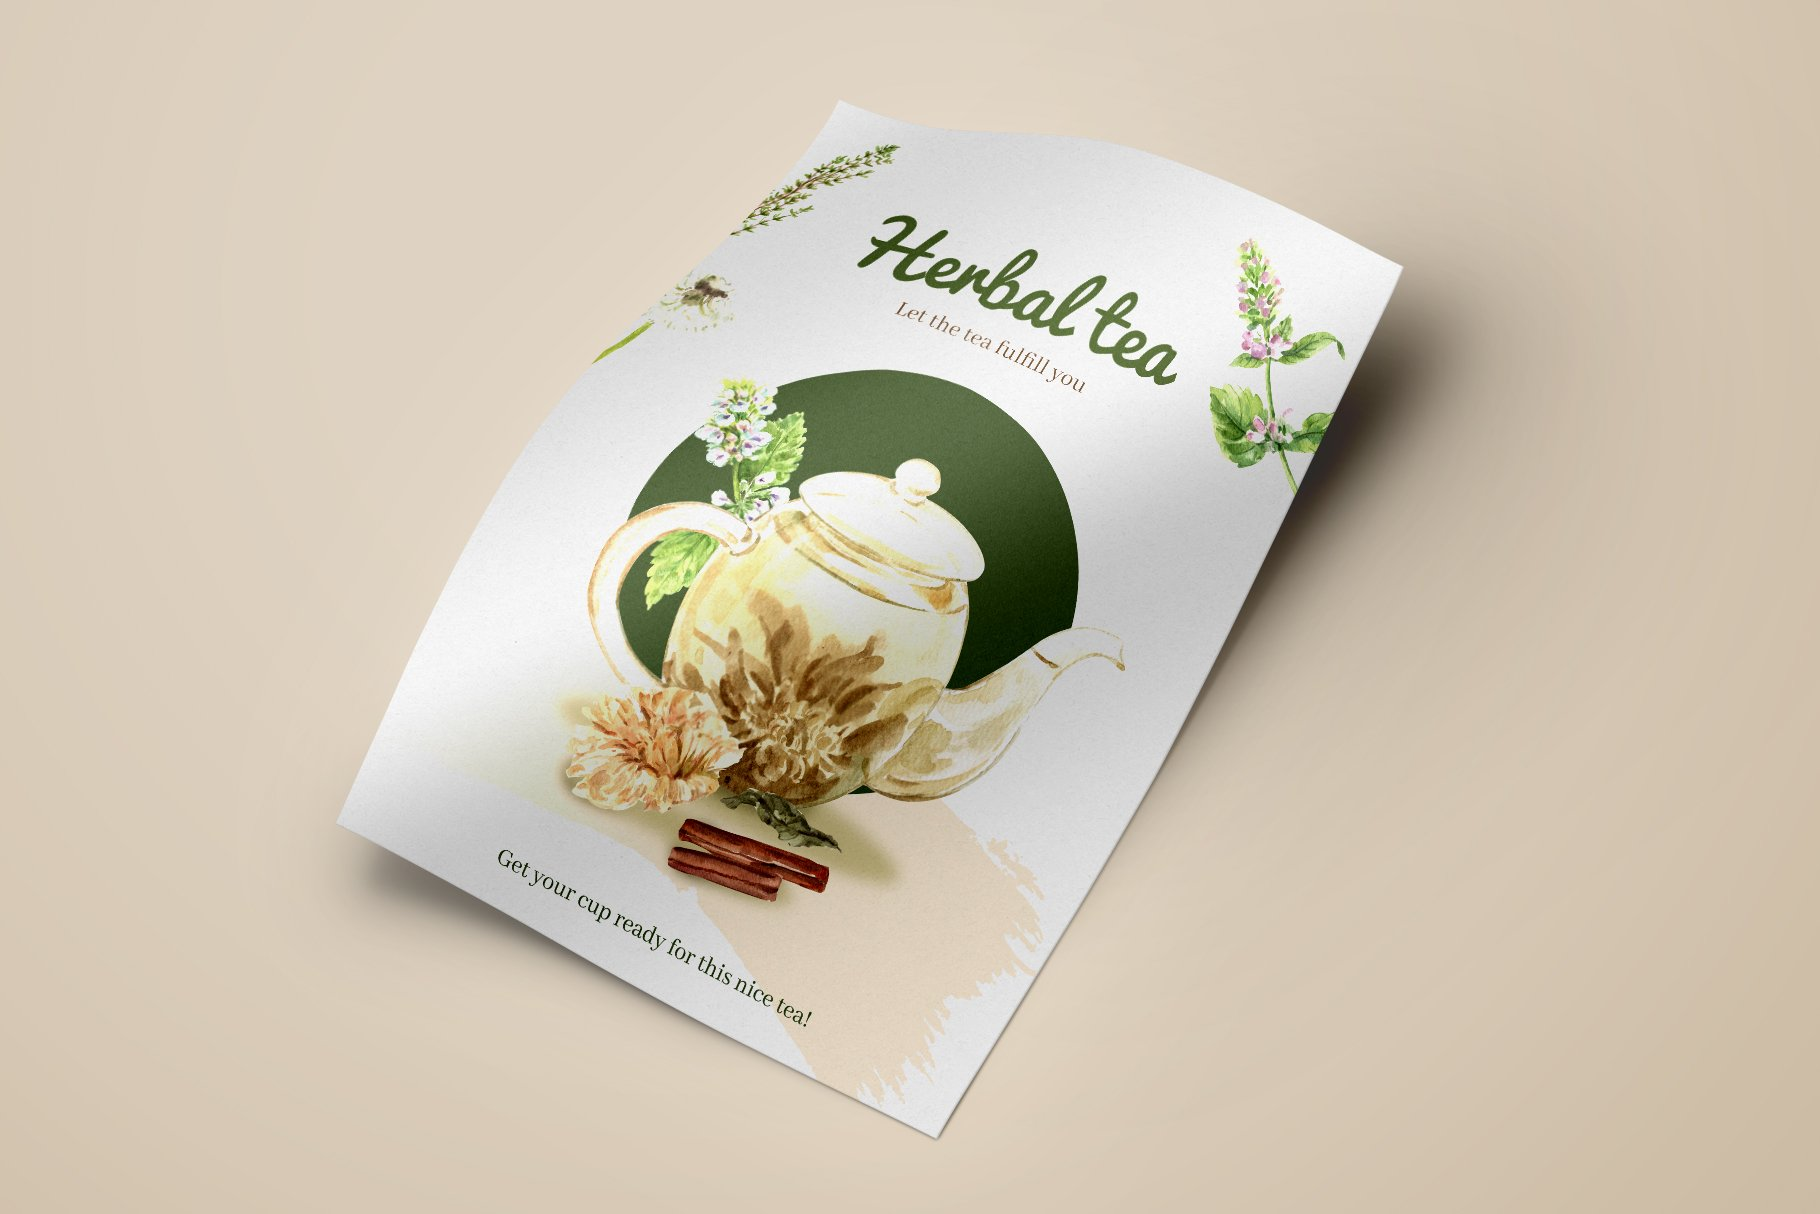 茶叶健康养生元素水彩画PNG免抠图片素材套装 Tea Time With Herbal Tea For Health插图(5)